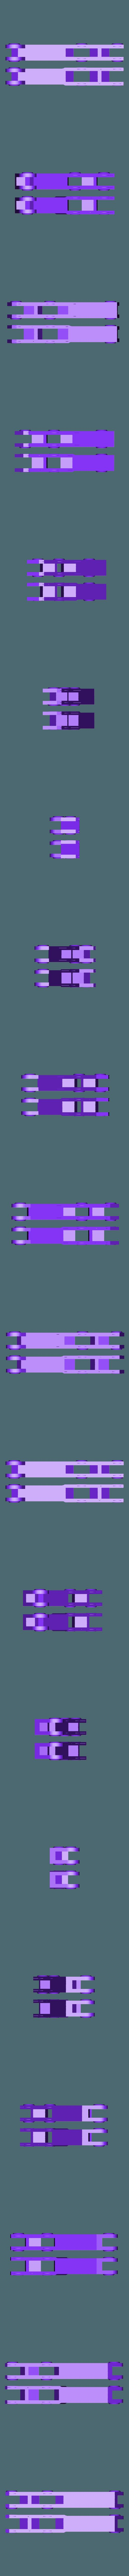 modif_pince_serre_joint2.stl Download free OBJ file serre joint remix • 3D printer design, Cyborg